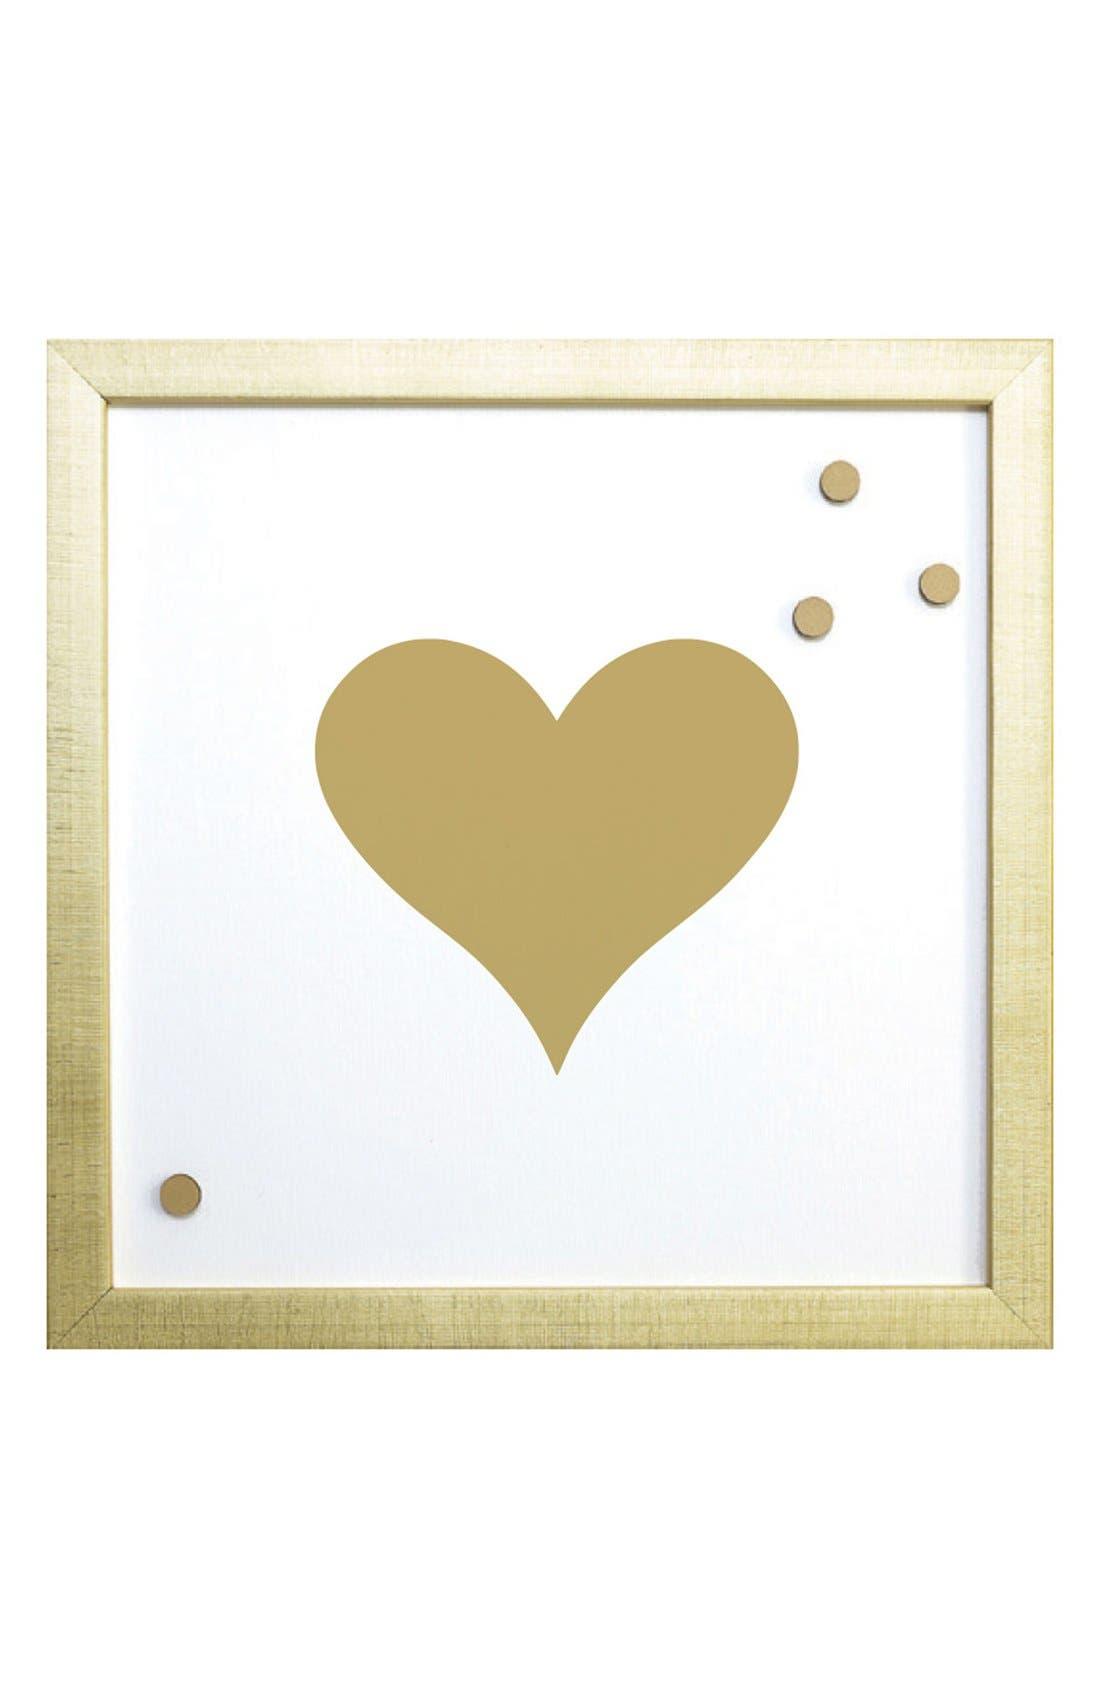 Alternate Image 1 Selected - Petal Lane 'Heart' Magnet Board